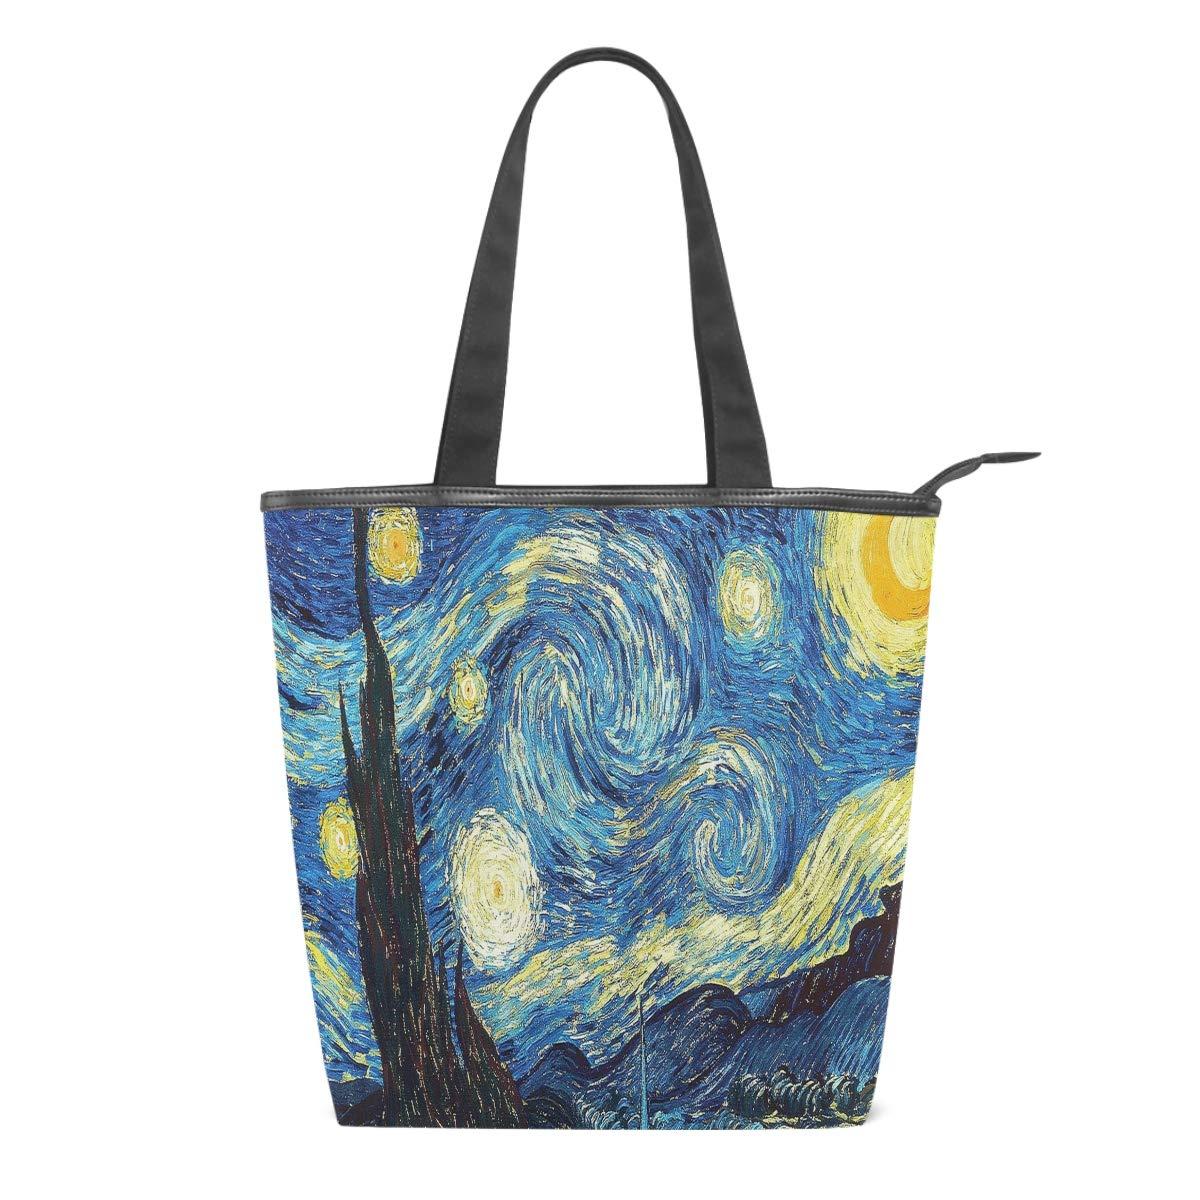 Van Gogh The Starry Night Women Canvas Tote Bag Galaxy Blue Girls Large School Book Shoulder Handle Shopping Laptop Organizer/Bags Handbag for Schools Beach Travel Work Gym Daily Use